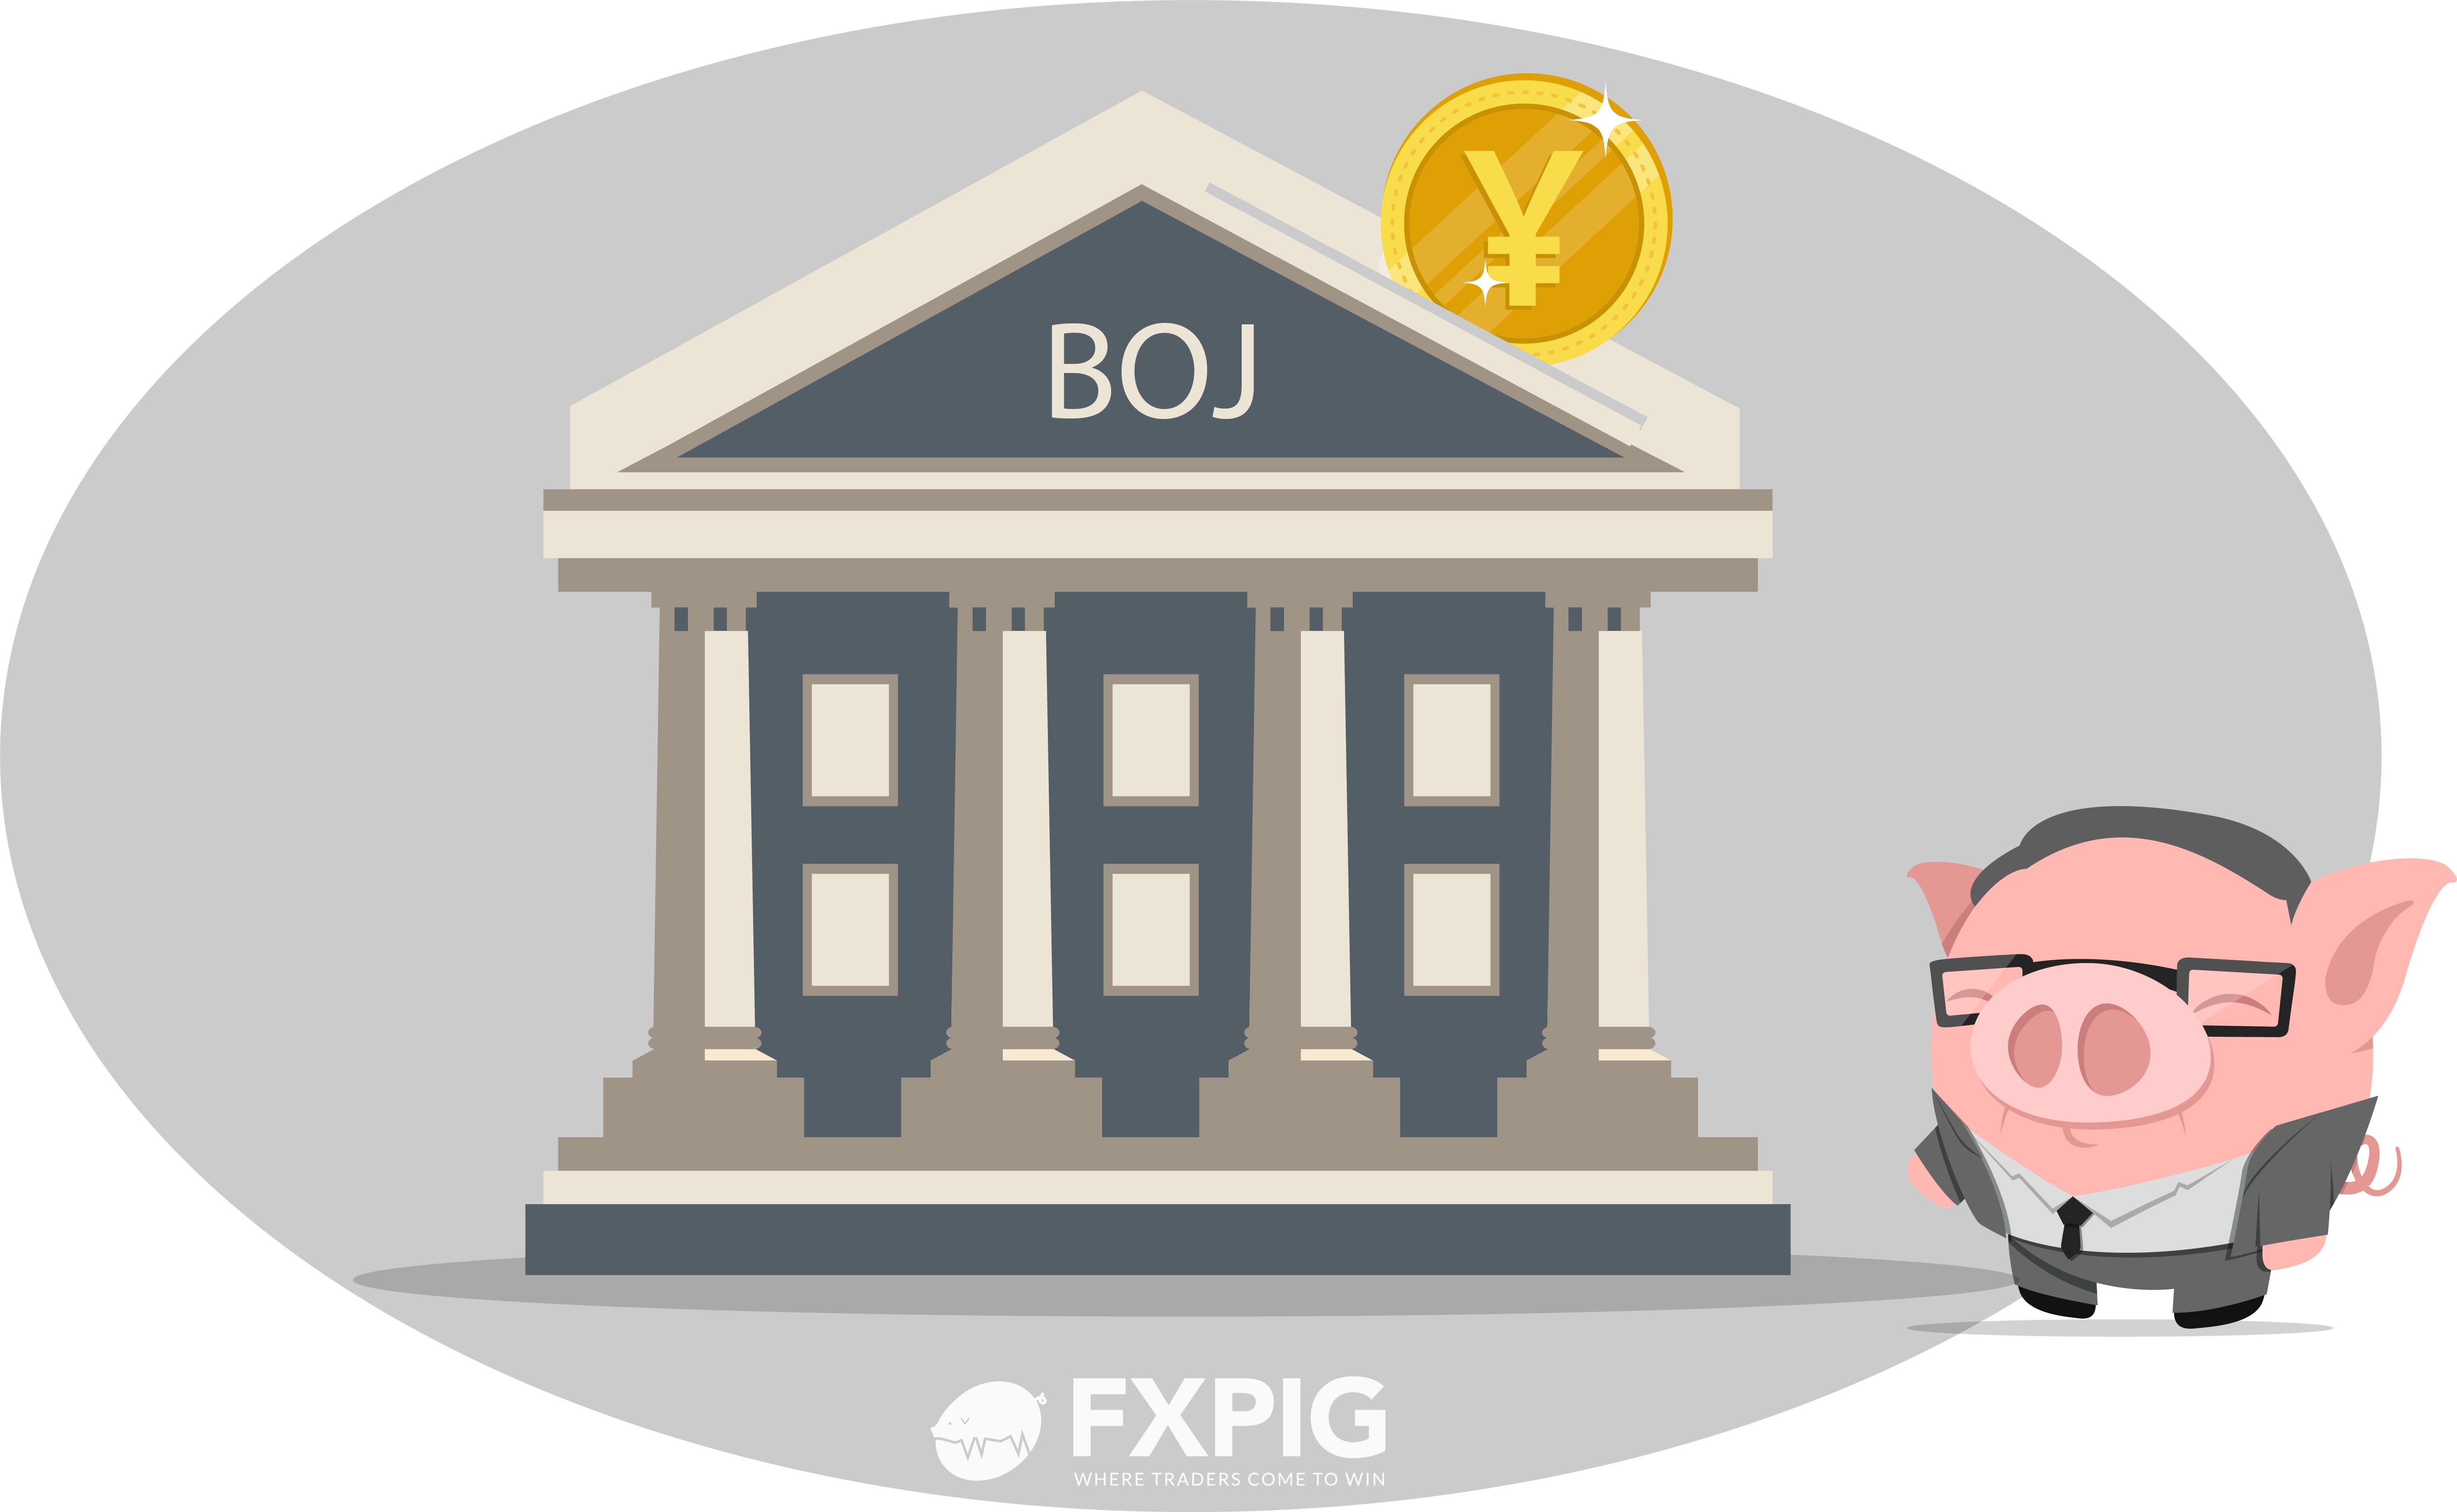 boj-policy-FXPIG